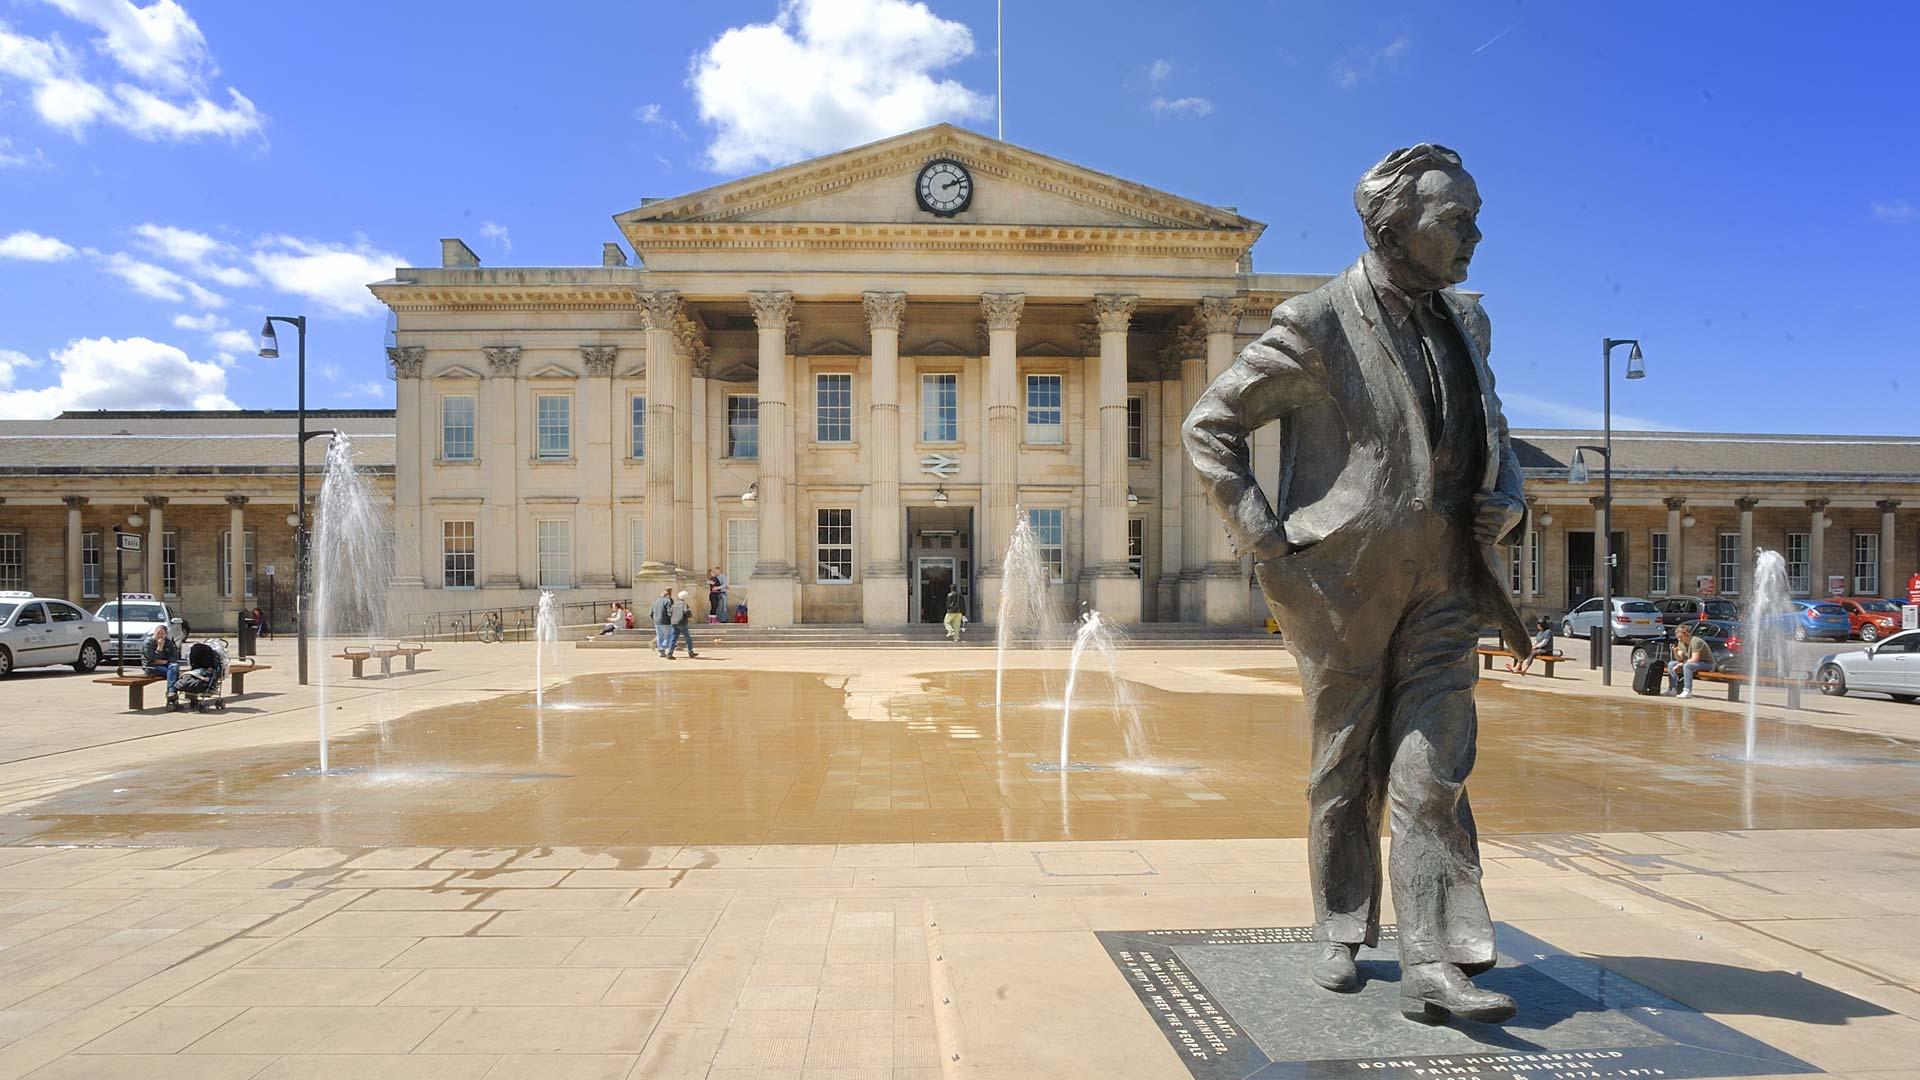 Harold Wilson statue at Huddersfield Train Station. @dinaras_travel_ diary Photo Credit: Dinara Abilova Source: Instagram